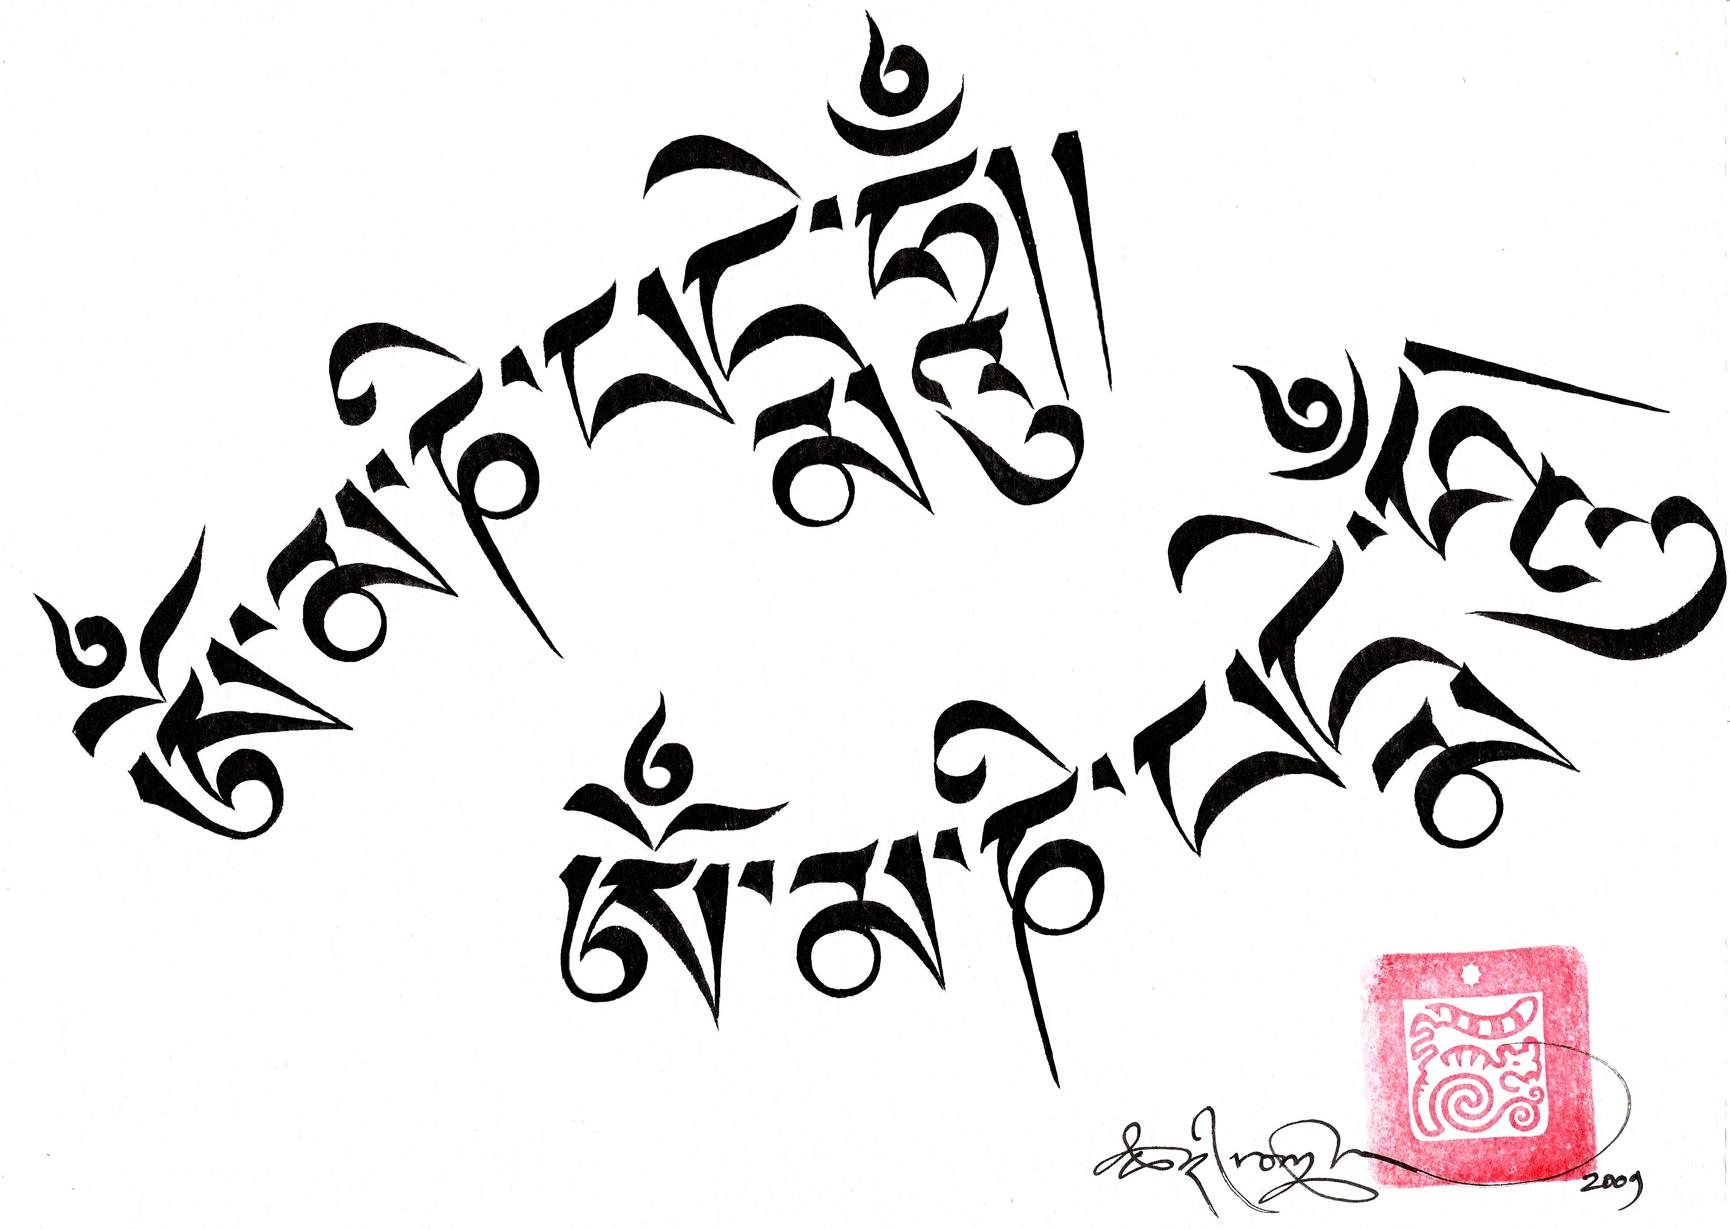 Mani Mantra